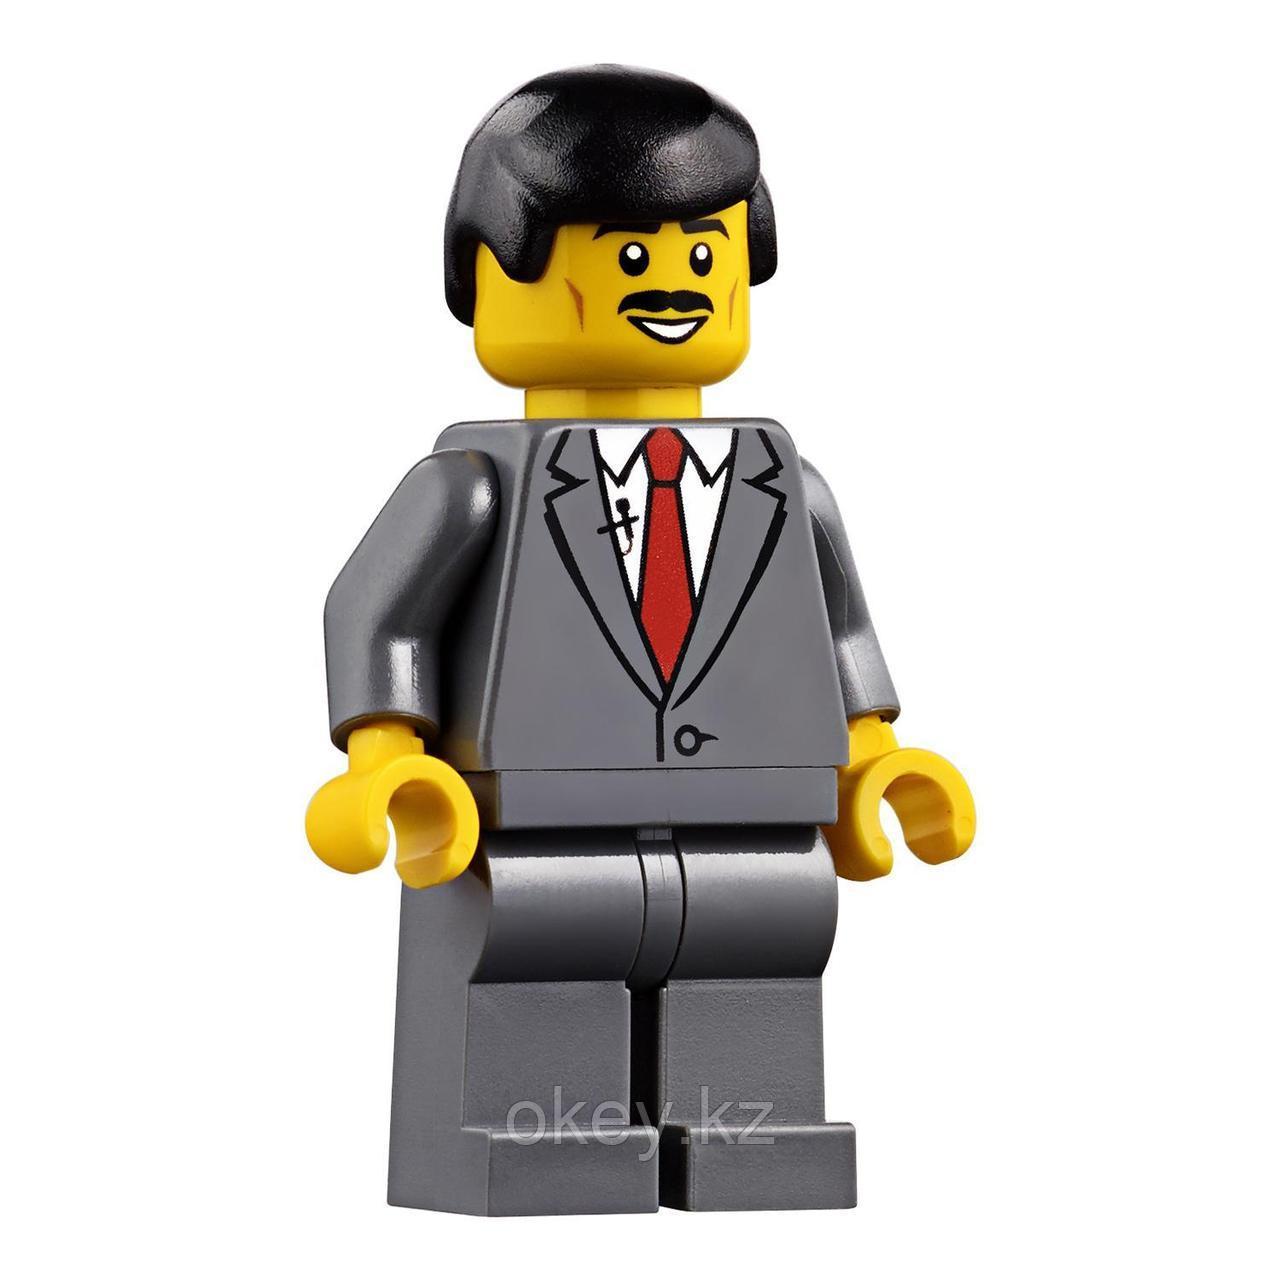 LEGO Ninjago Movie: Робот землетрясений 70632 - фото 10